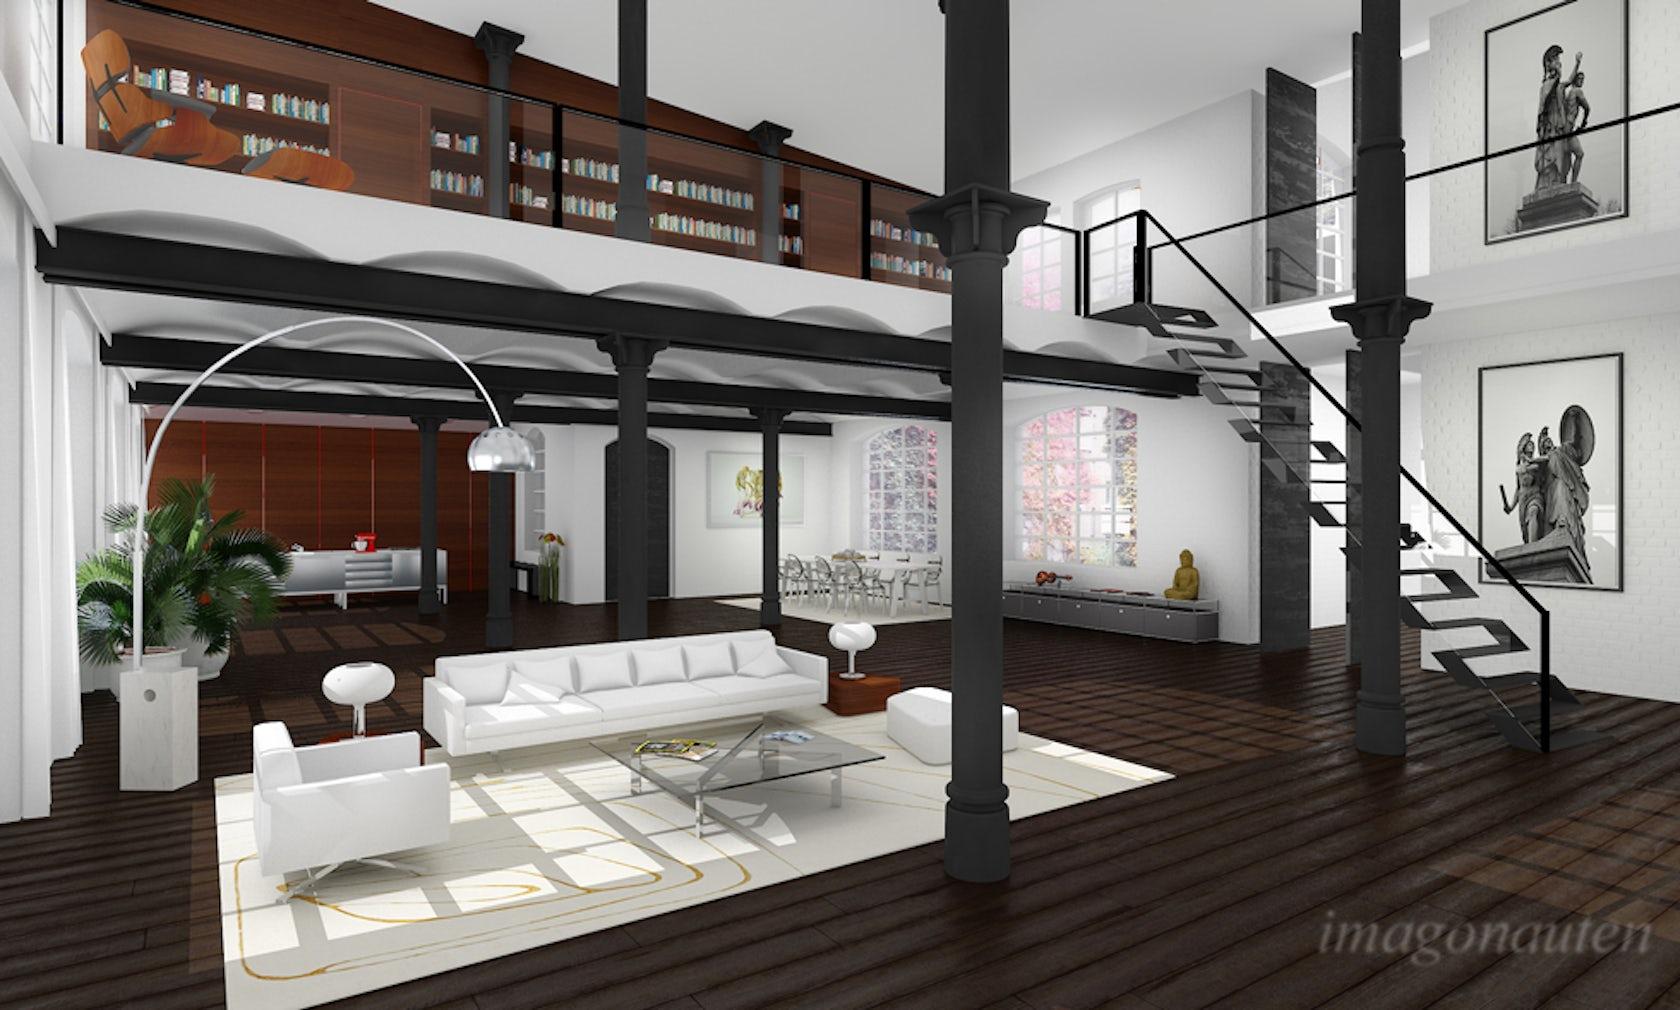 Luxury Apartment - Berlin 2013 - Architizer